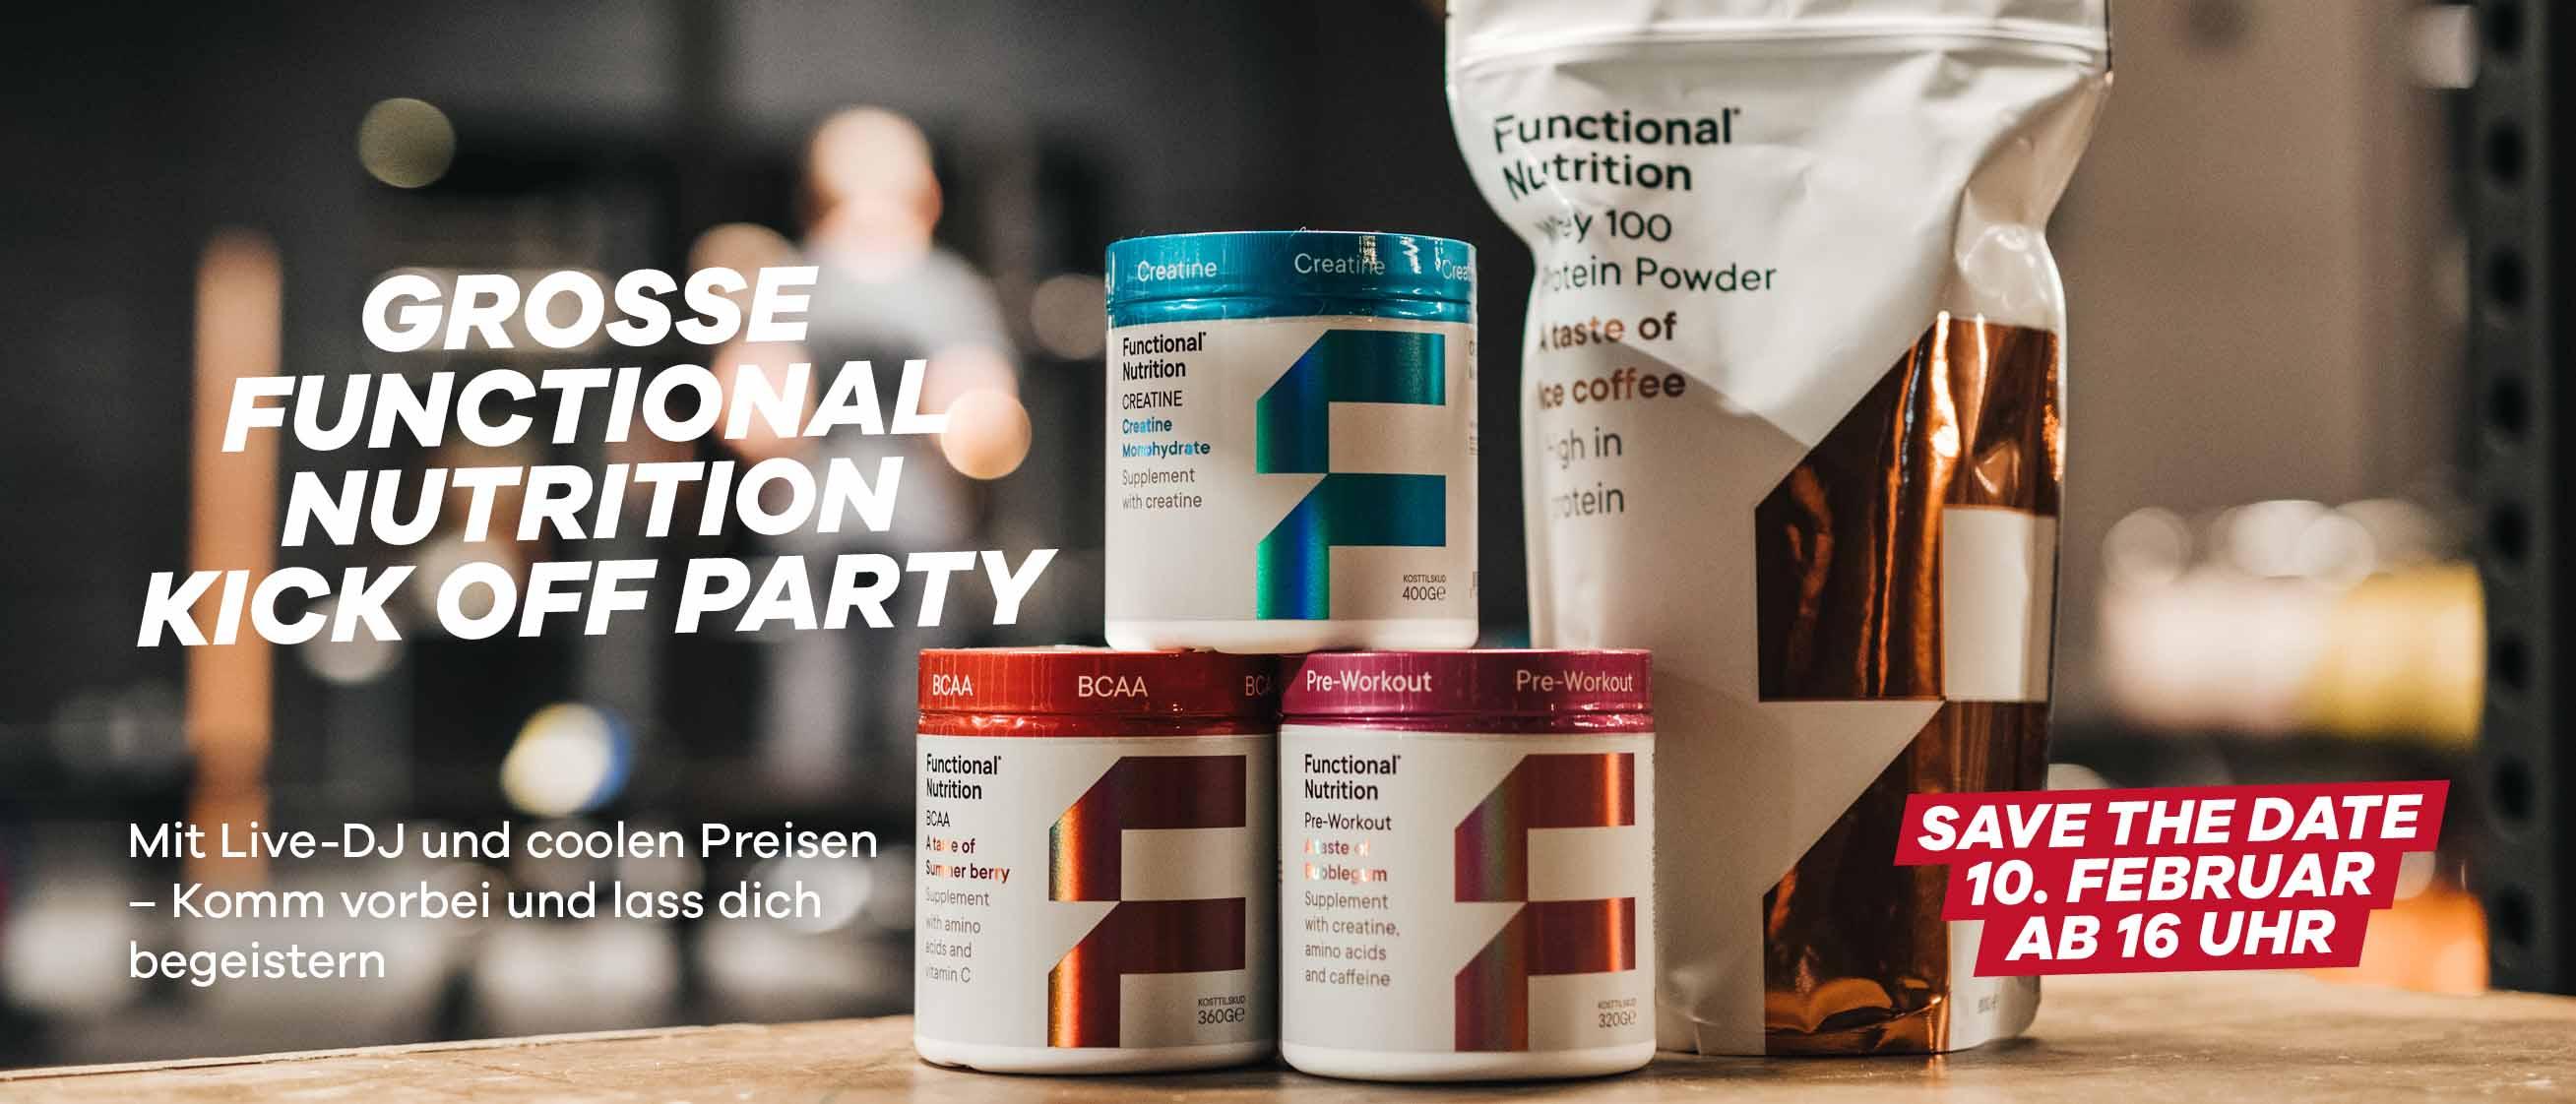 Ab 10. Februar 2020: Functional Nutrition